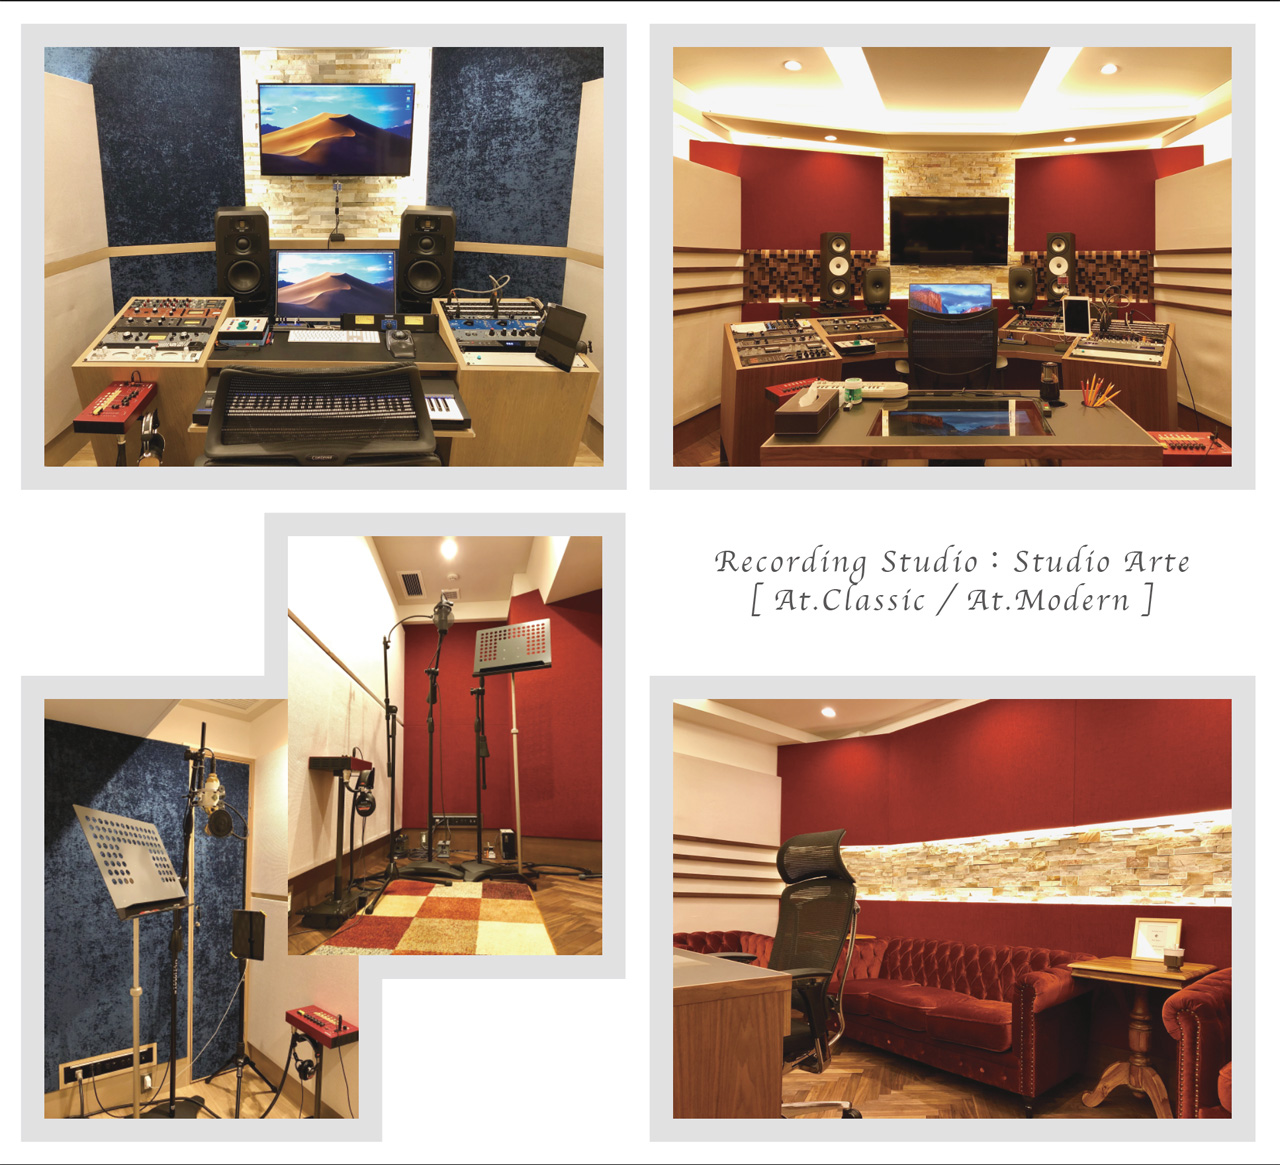 Recording Studio : Studio Arte [At. Classic / At. Modern]